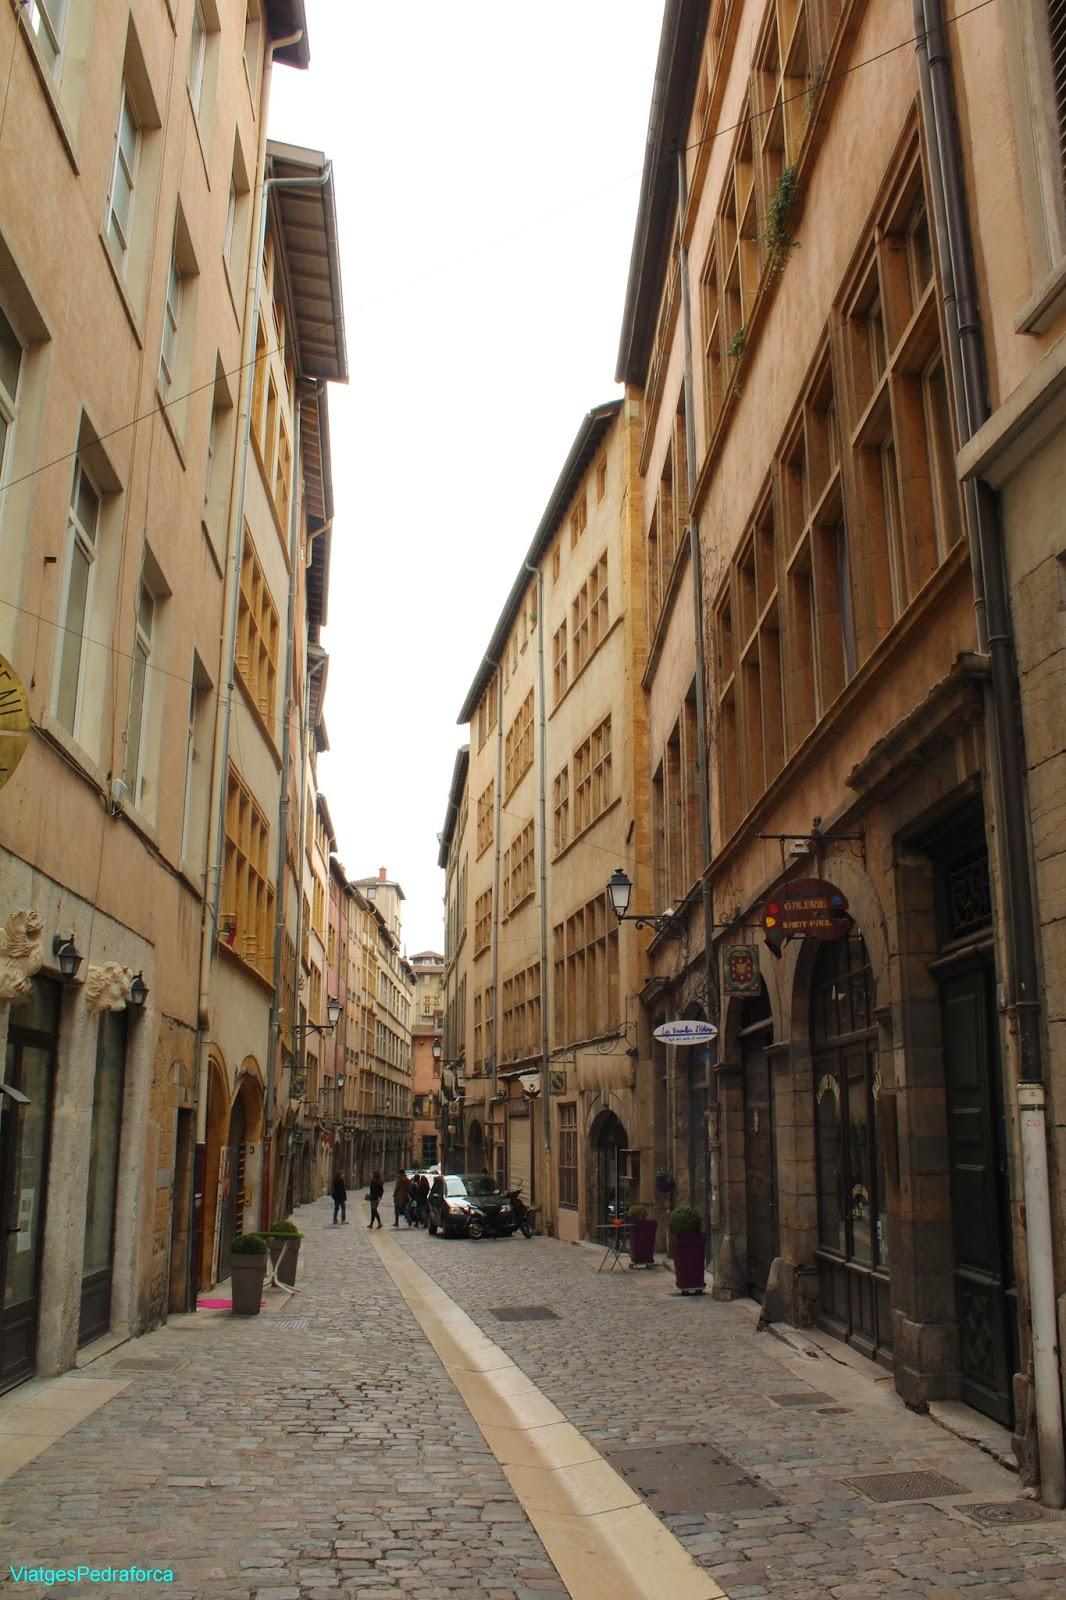 Vieux Lyon, rue Saint-Jean, rue Juiverie, Lió, Rhône-Alpes, França, France, Unesco World Heritatge, Patrimoni de la Humanitat